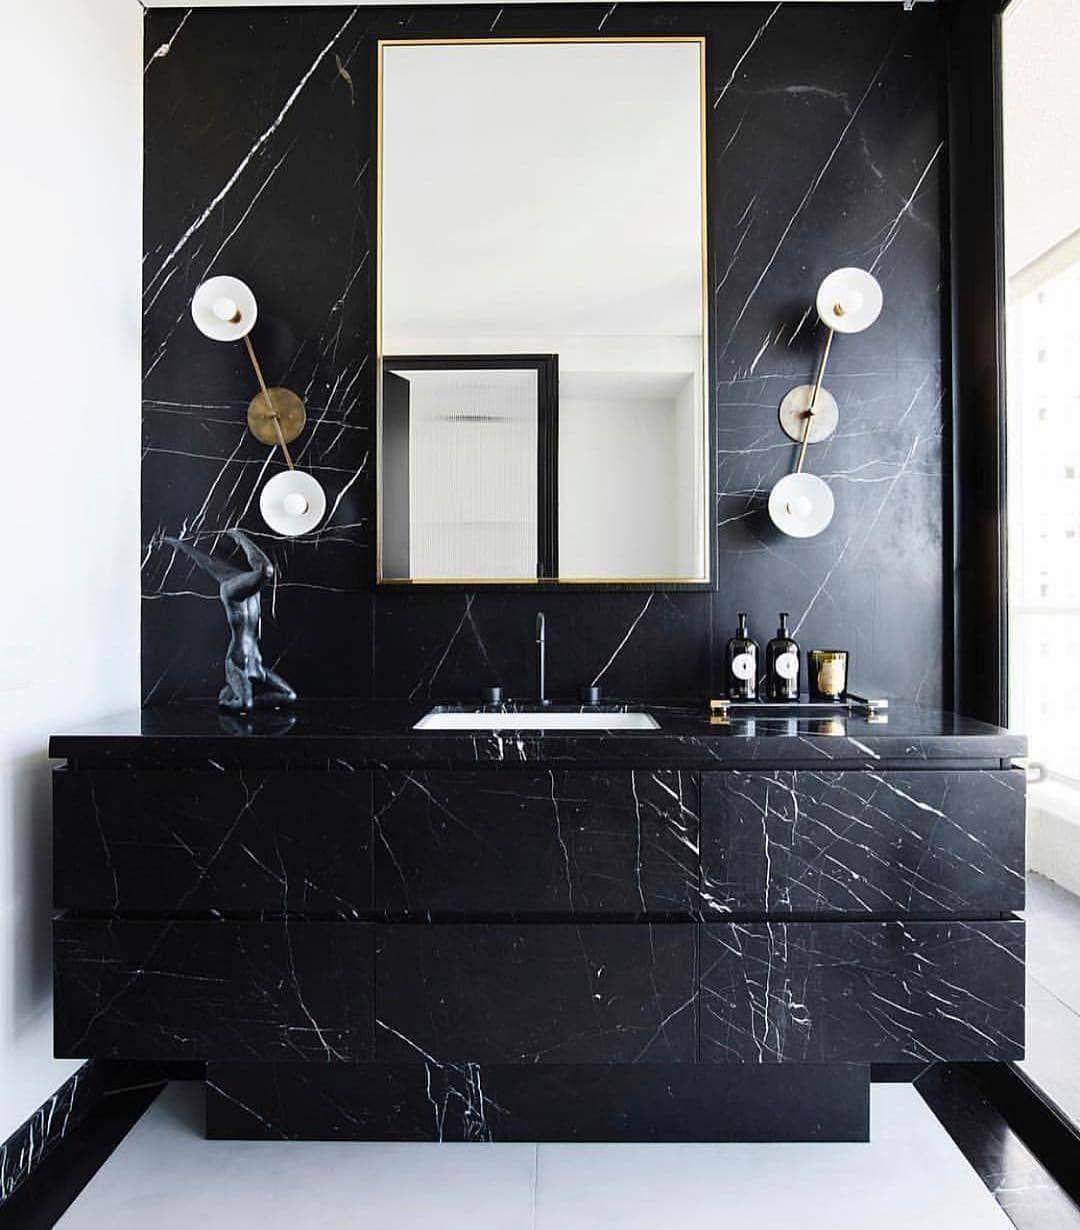 Courtney Schrank Design Studio On Instagram Black Tie Affair Minimalism Means Letting The Ma Luxury Bathroom Vanities Black Marble Bathroom Bathroom Design